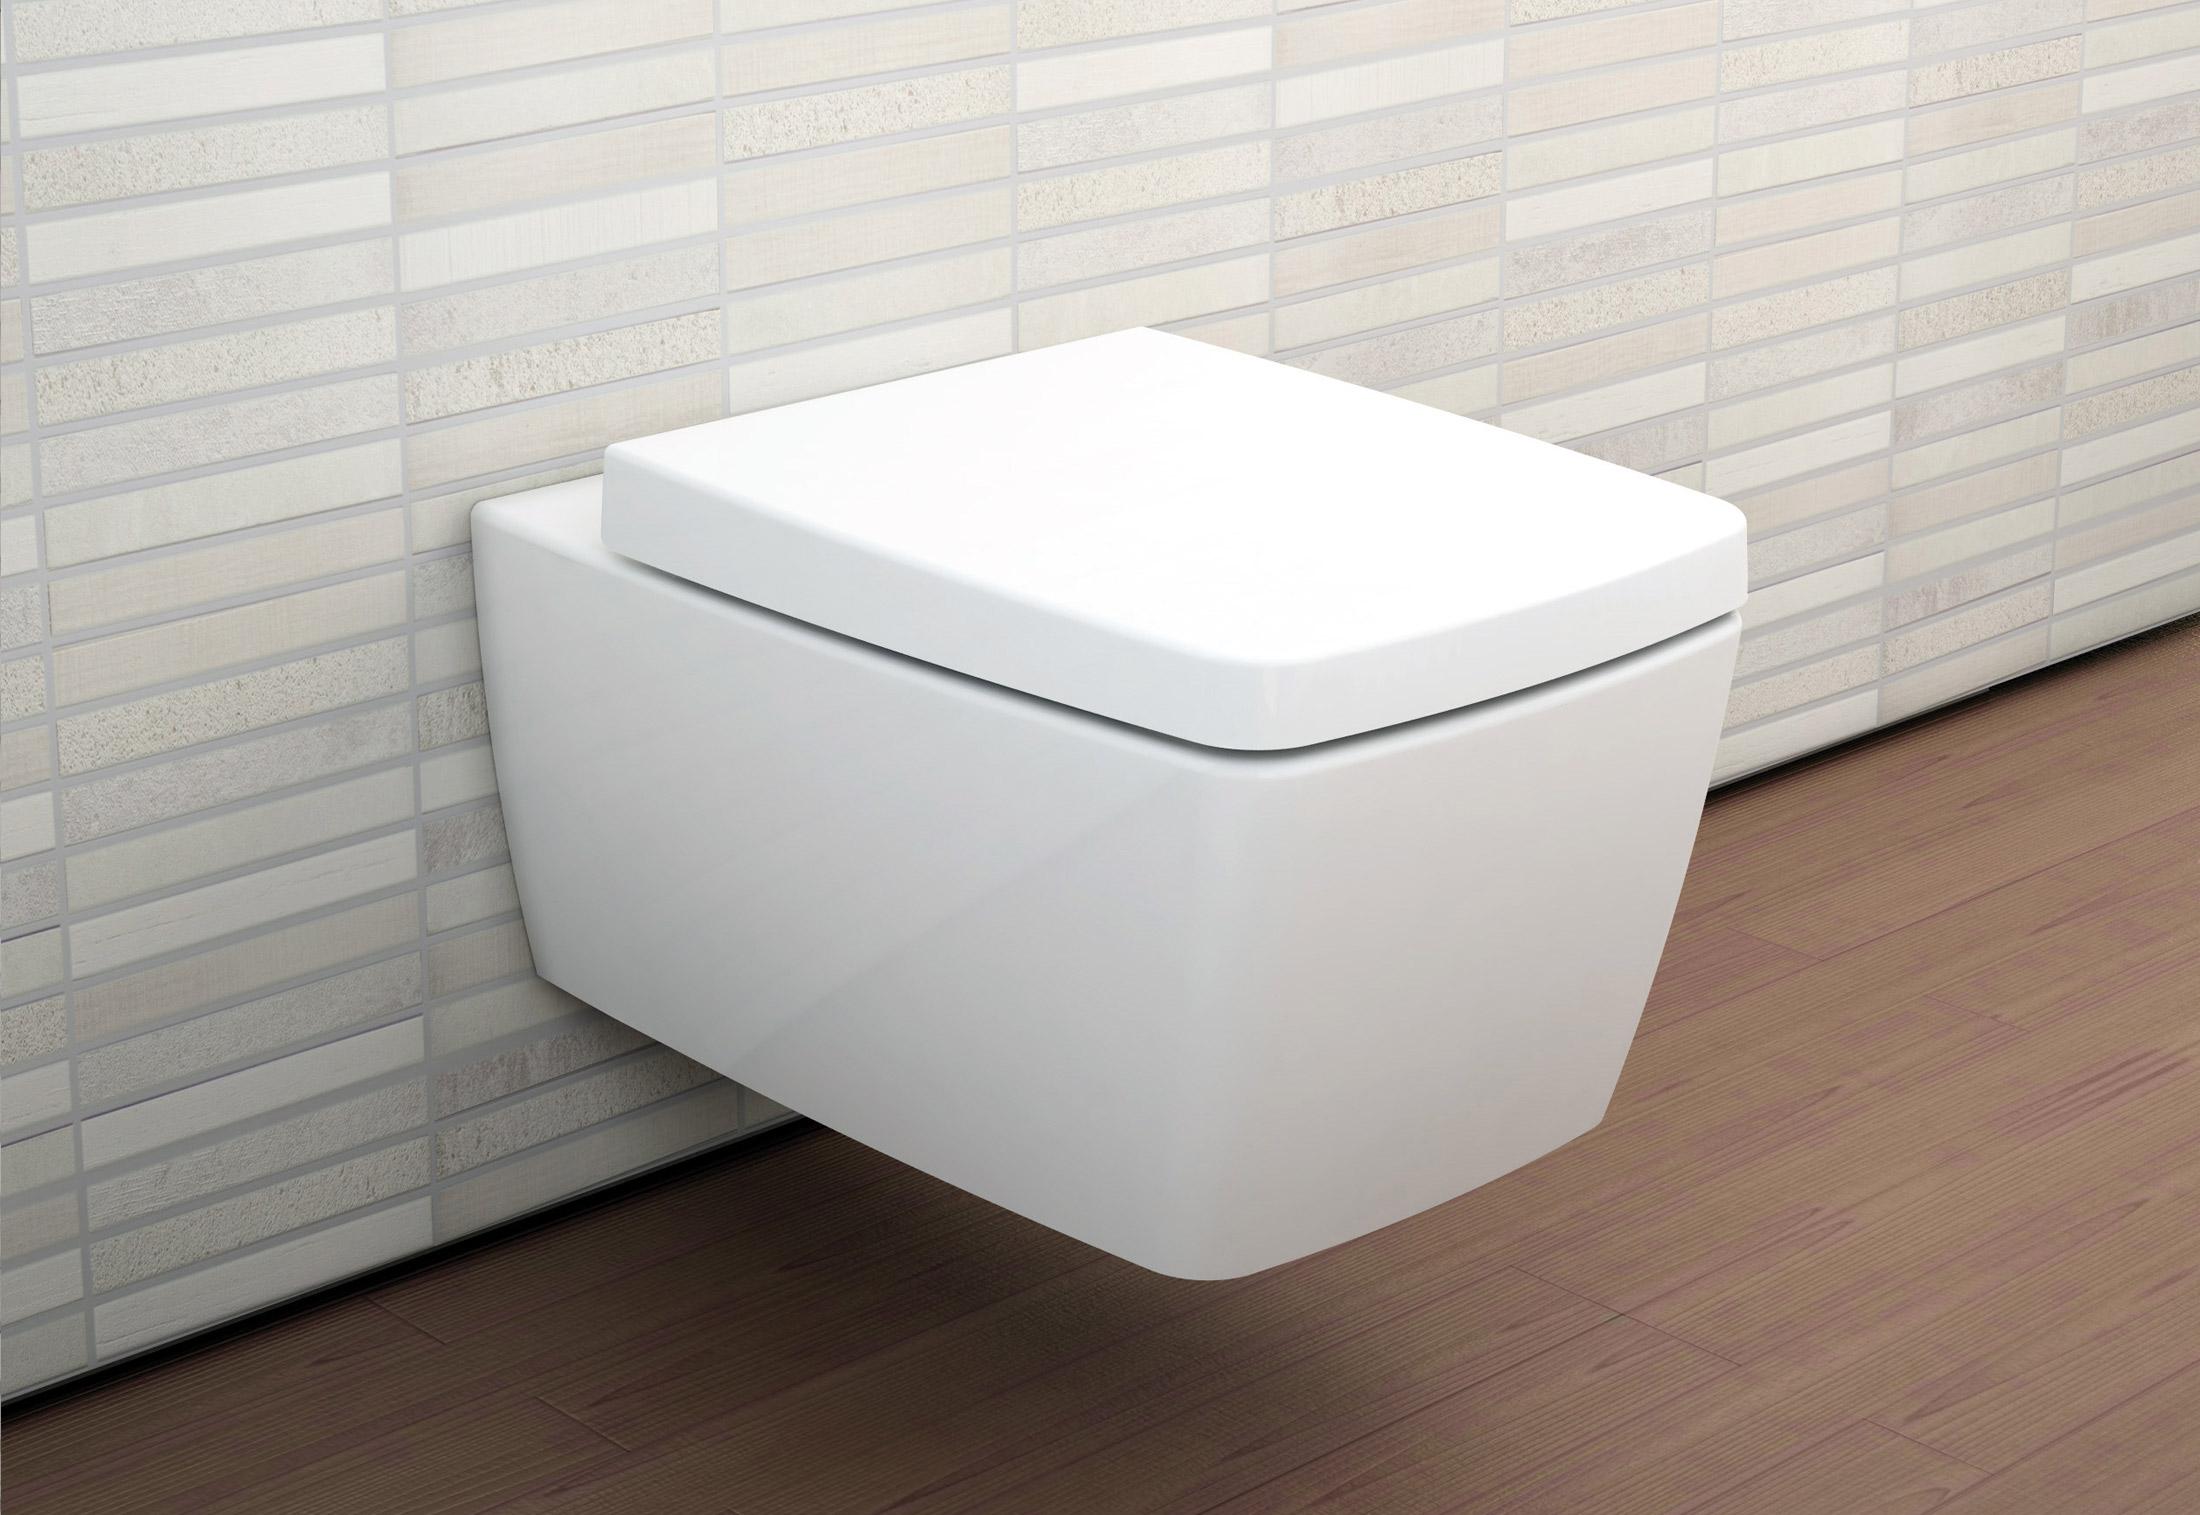 metropole wand wc vitraflush von vitra bathroom stylepark. Black Bedroom Furniture Sets. Home Design Ideas